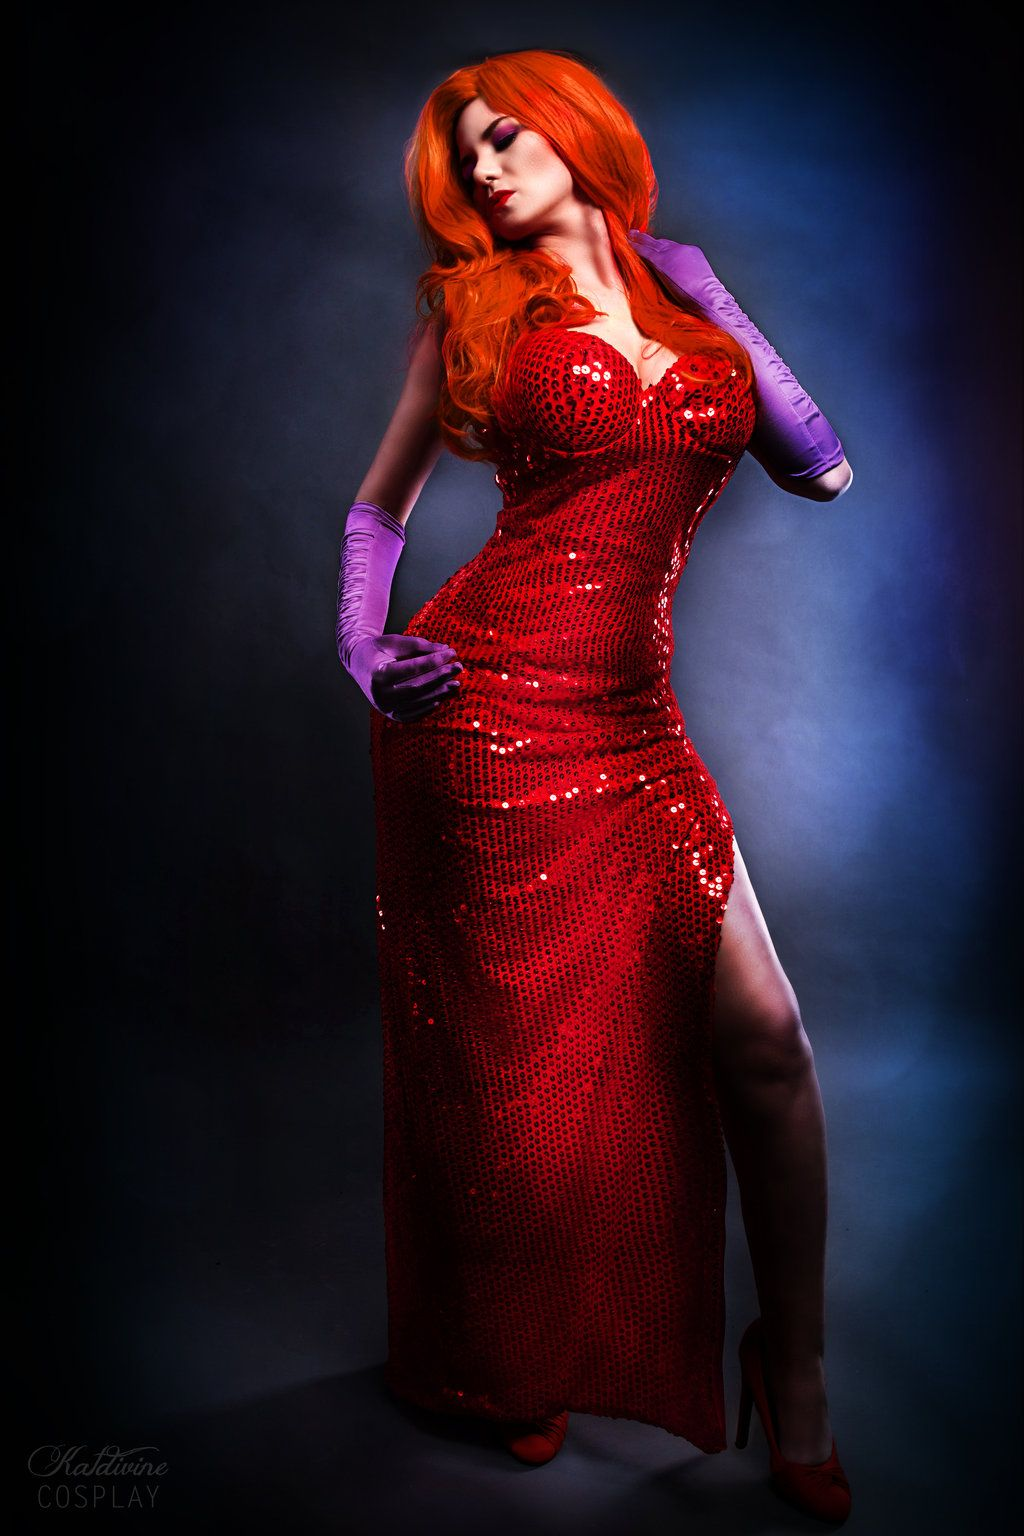 Kat Divine as Jessica Rabbit.